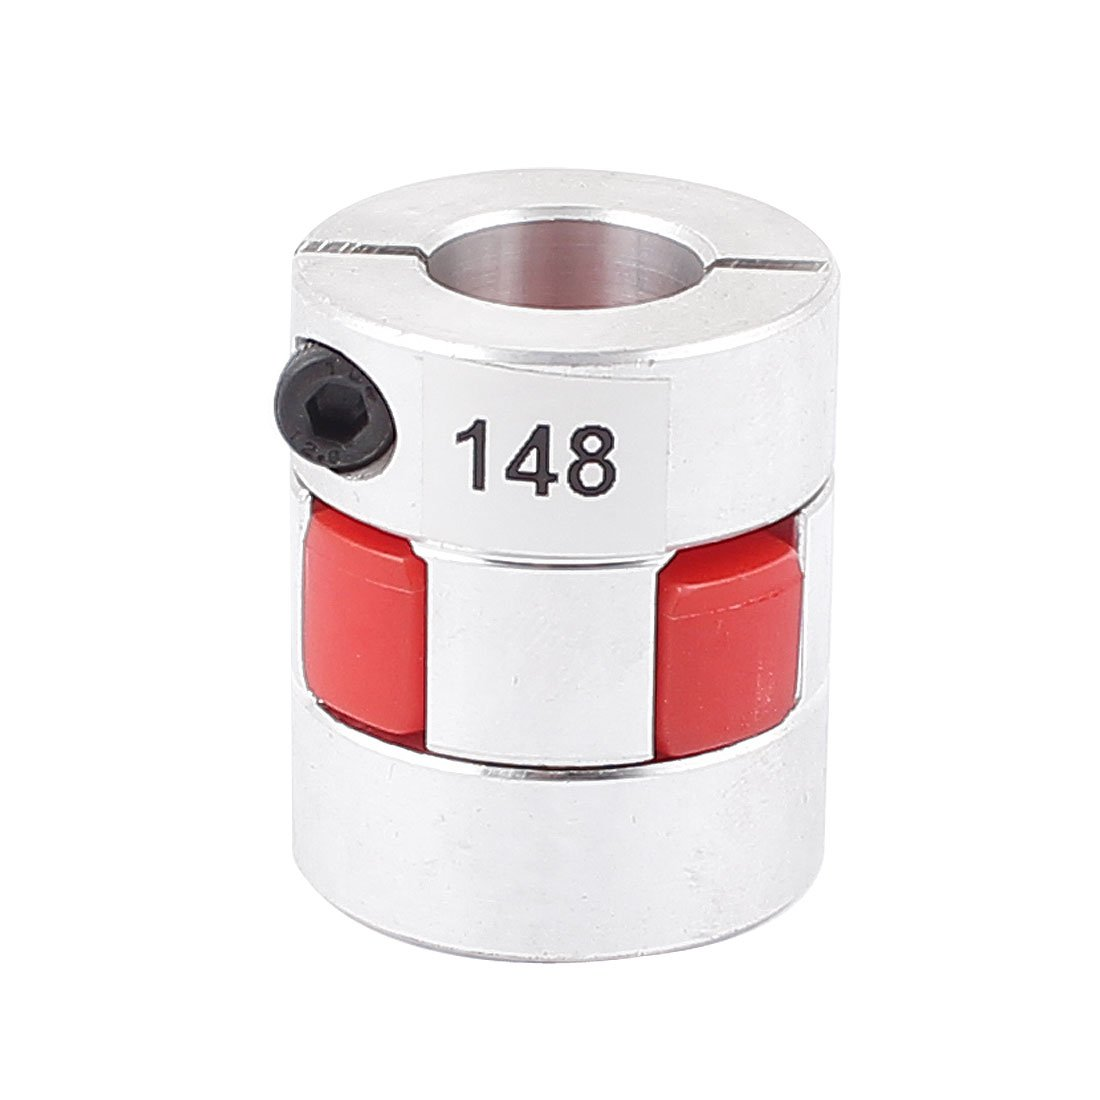 uxcell 15mm x 15mm CNC Jaw Spider Plum Coupling Shaft Coupler D 30mm L 35mm